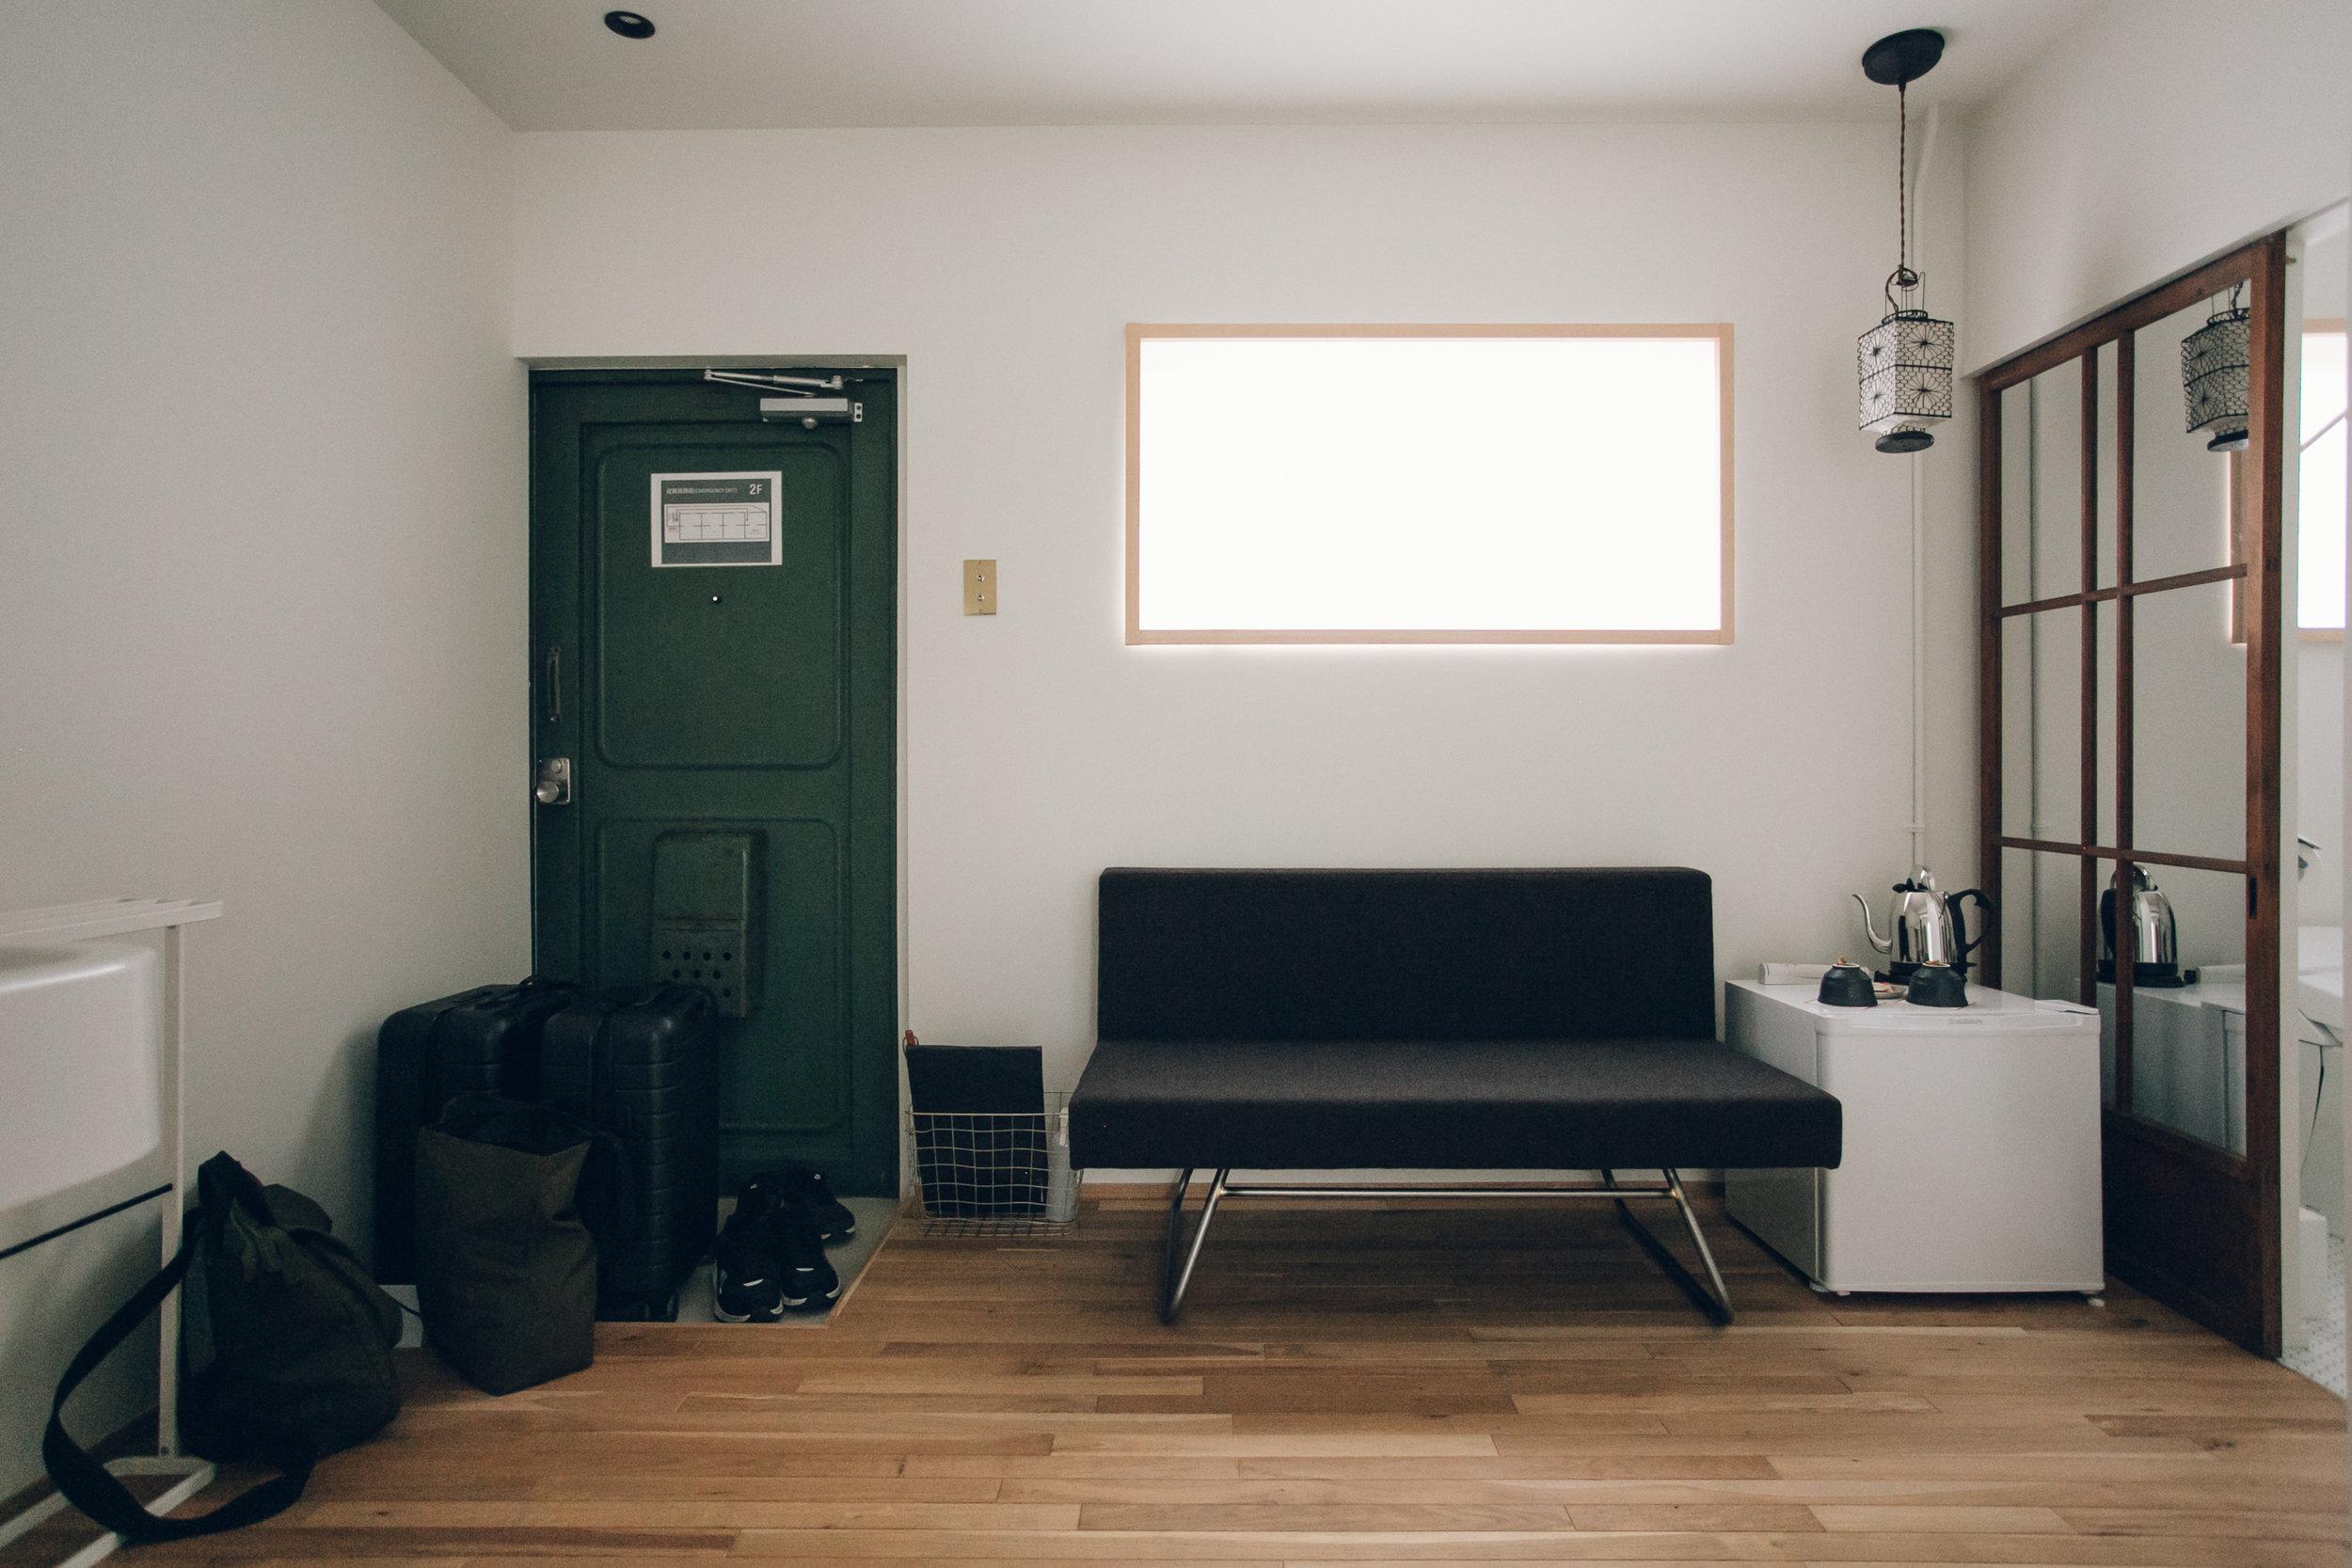 Concrete interior. Our Airbnb in Kyoto - Haarkon in Japan.